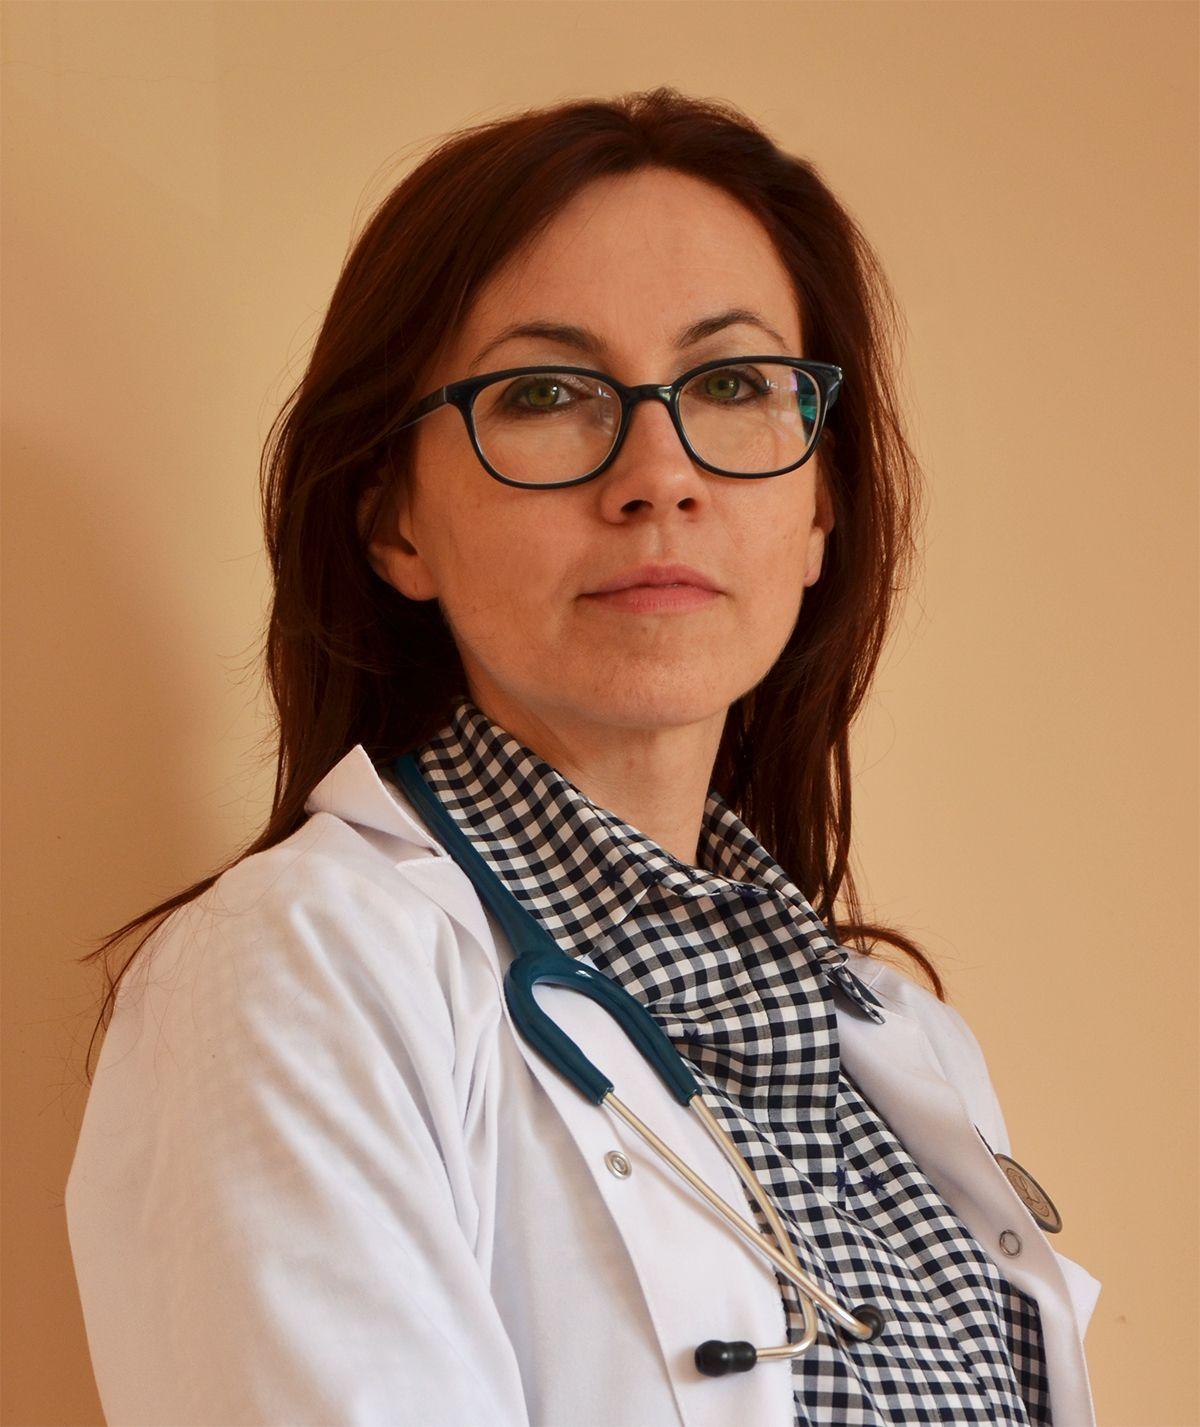 dr.Malinowska